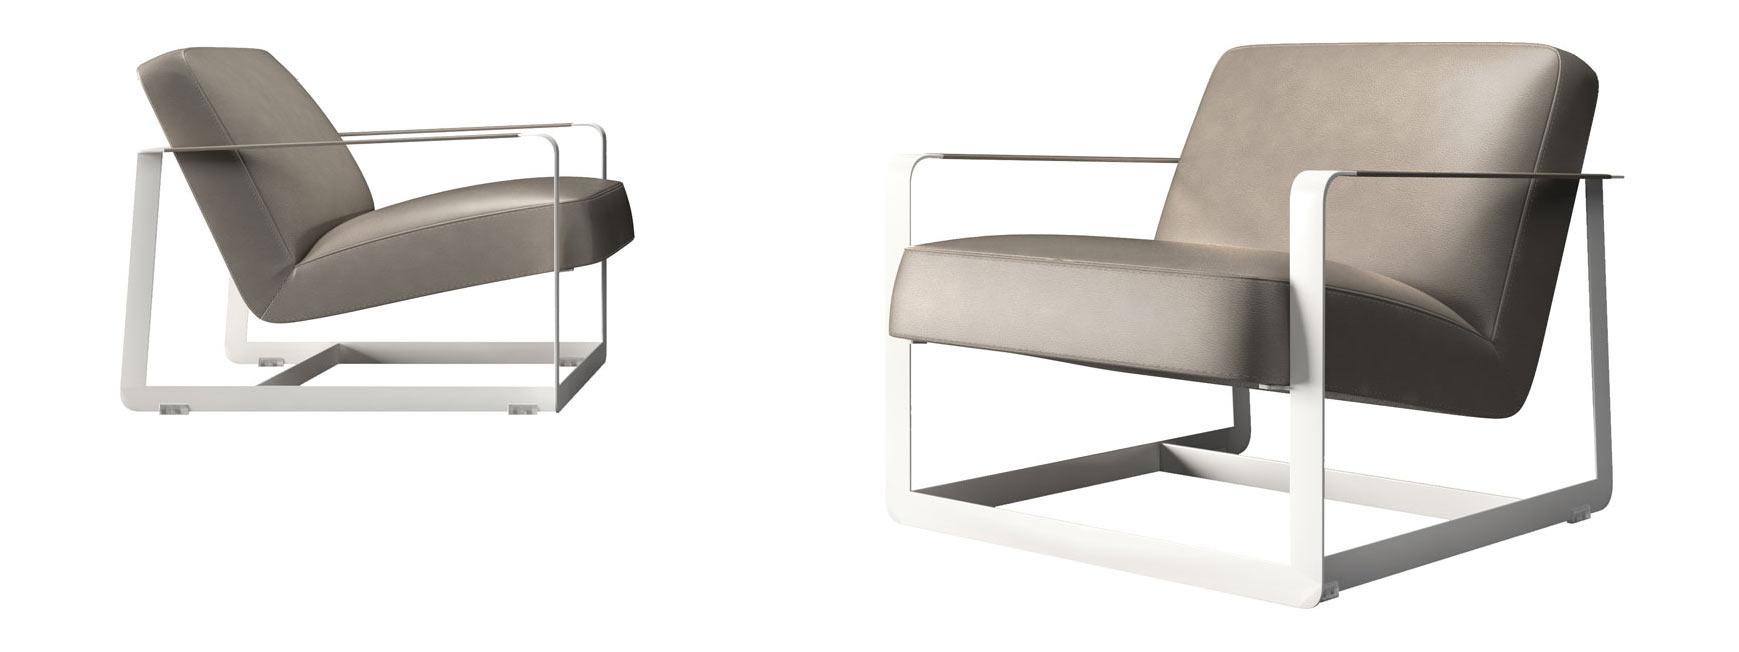 Crosby lounge chair castle gray by modloft